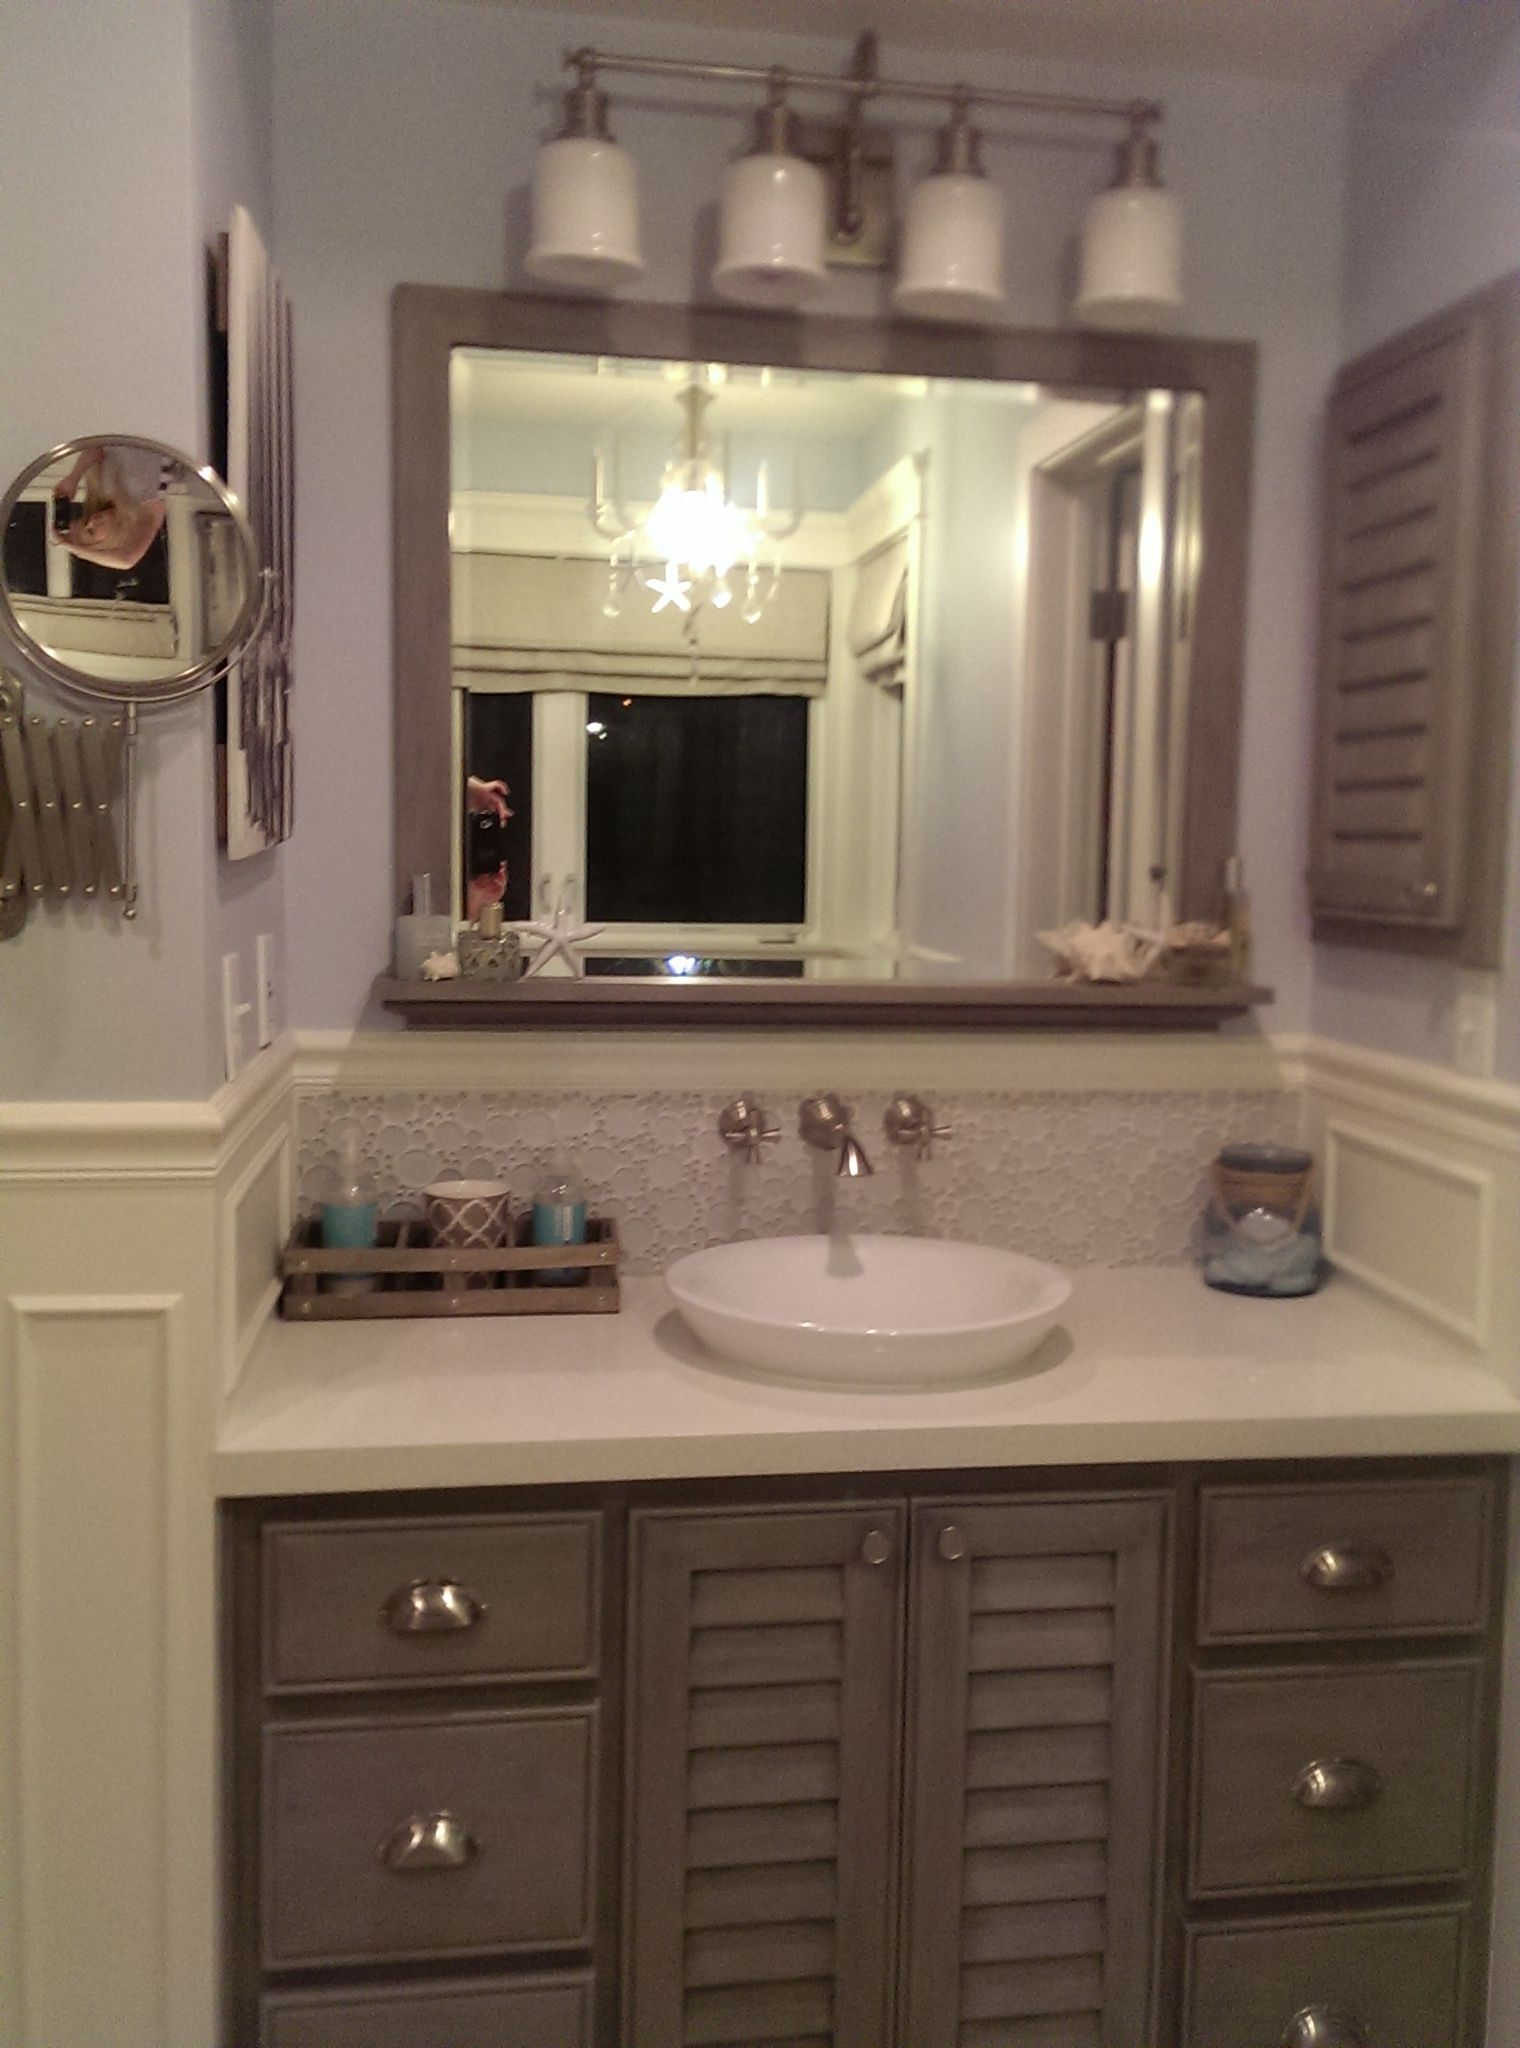 Bathroom Vanity In Driftwood Stain 2 Colors Of Chalk Paint Custom Ledge Mirror Newport Brass Wall Mount Fixtures Matte A Room Tiles Bathroom Decor Bathroom